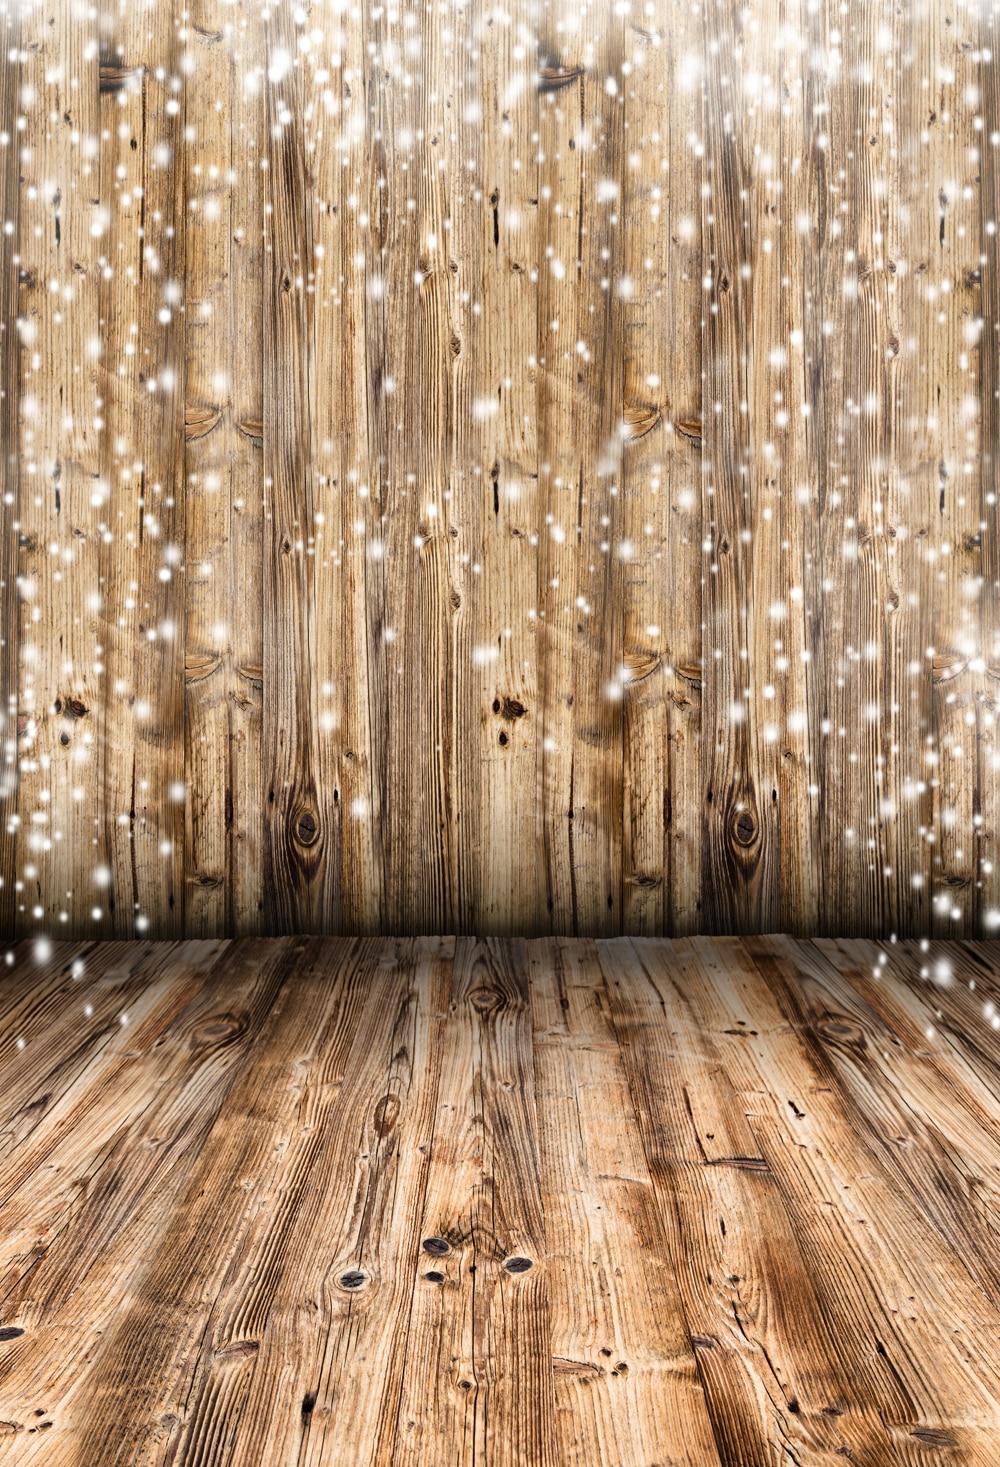 HUAYI 10x20ft wood floor backdrop wood vinyl wedding photography backdrops photo props background wood XT 6393